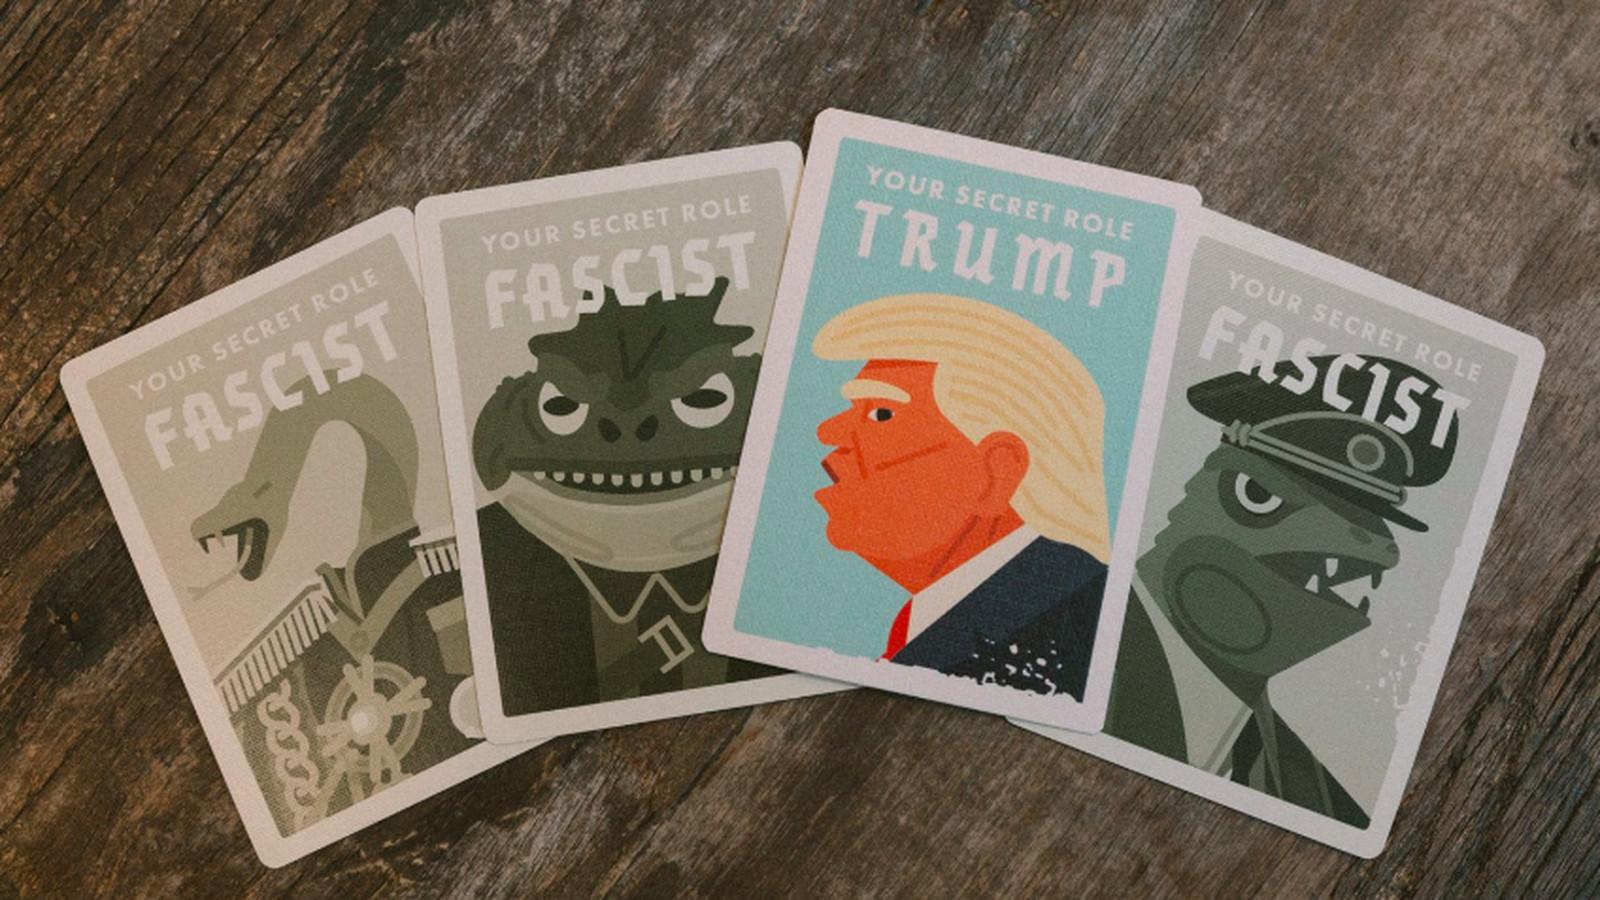 Secret Hitler S Gen Con Exclusive Is A Trump Fascist Card